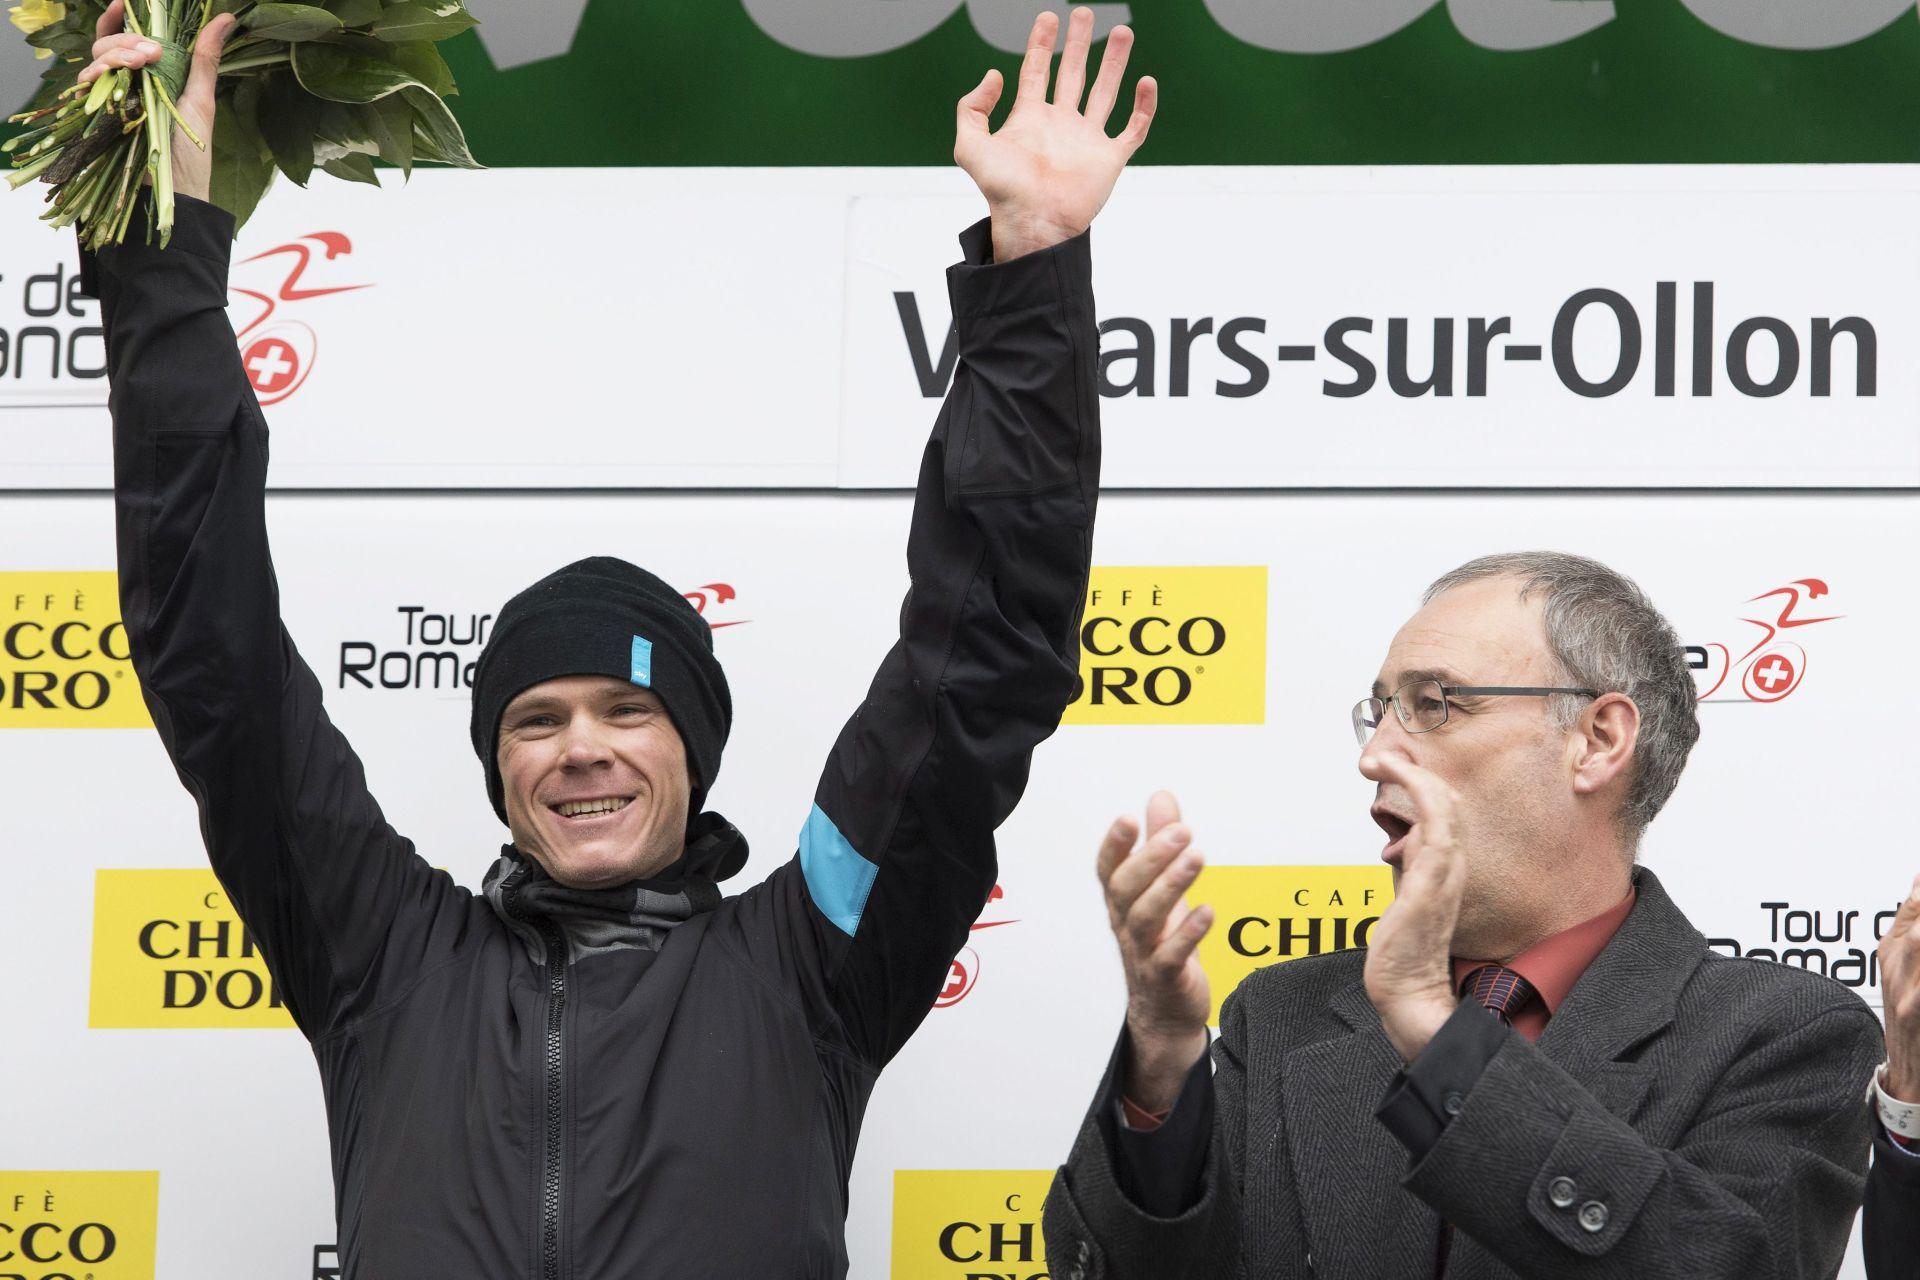 Tour de Romandie: Froomeu etapa, Quintana zadržao vodstvo, Kišerlovski odustao